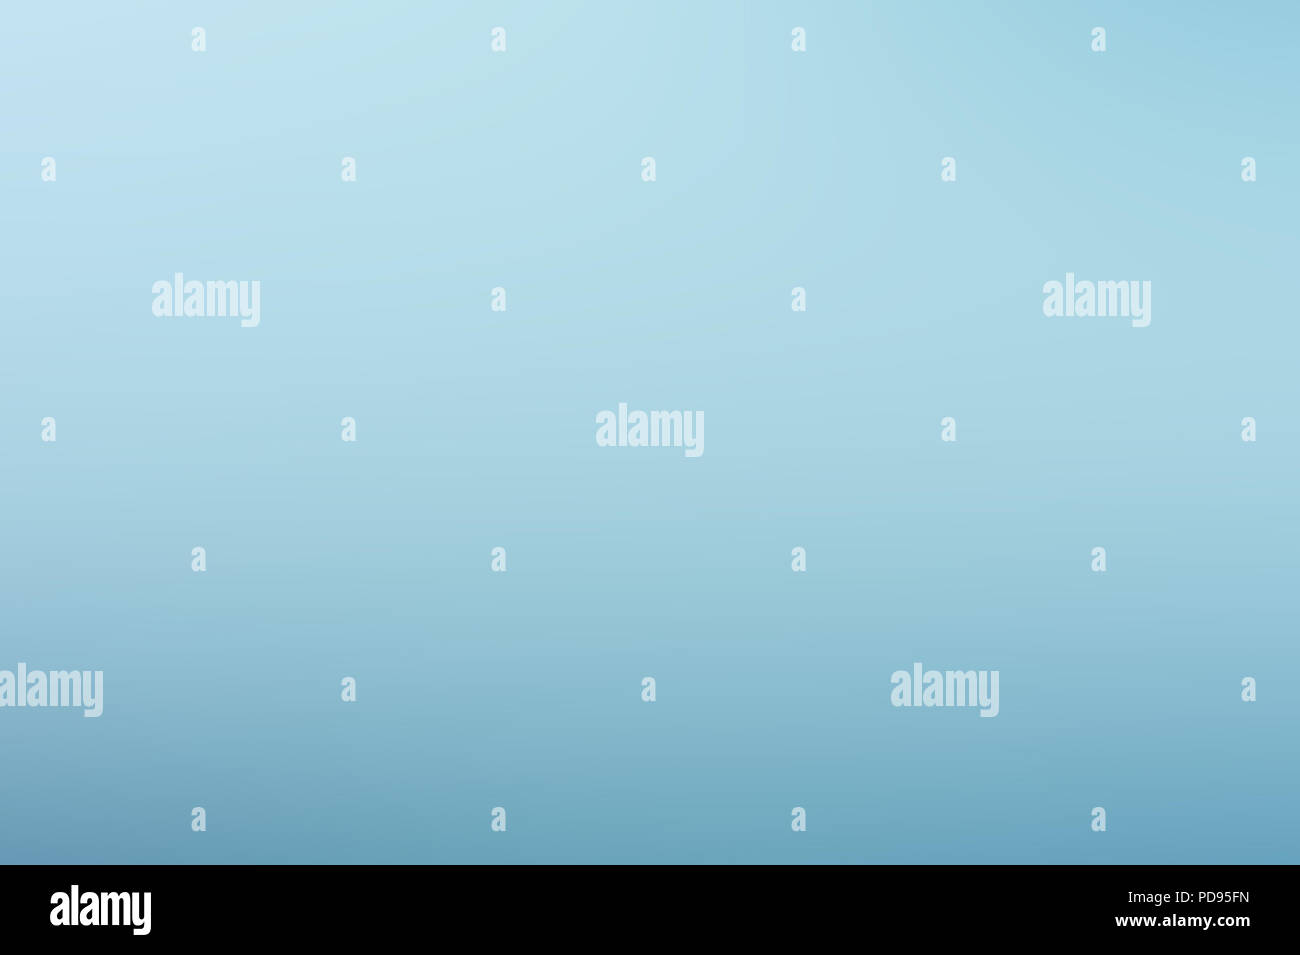 Gradiente hermoso cielo azul claro sin nubes antecedentes Imagen De Stock